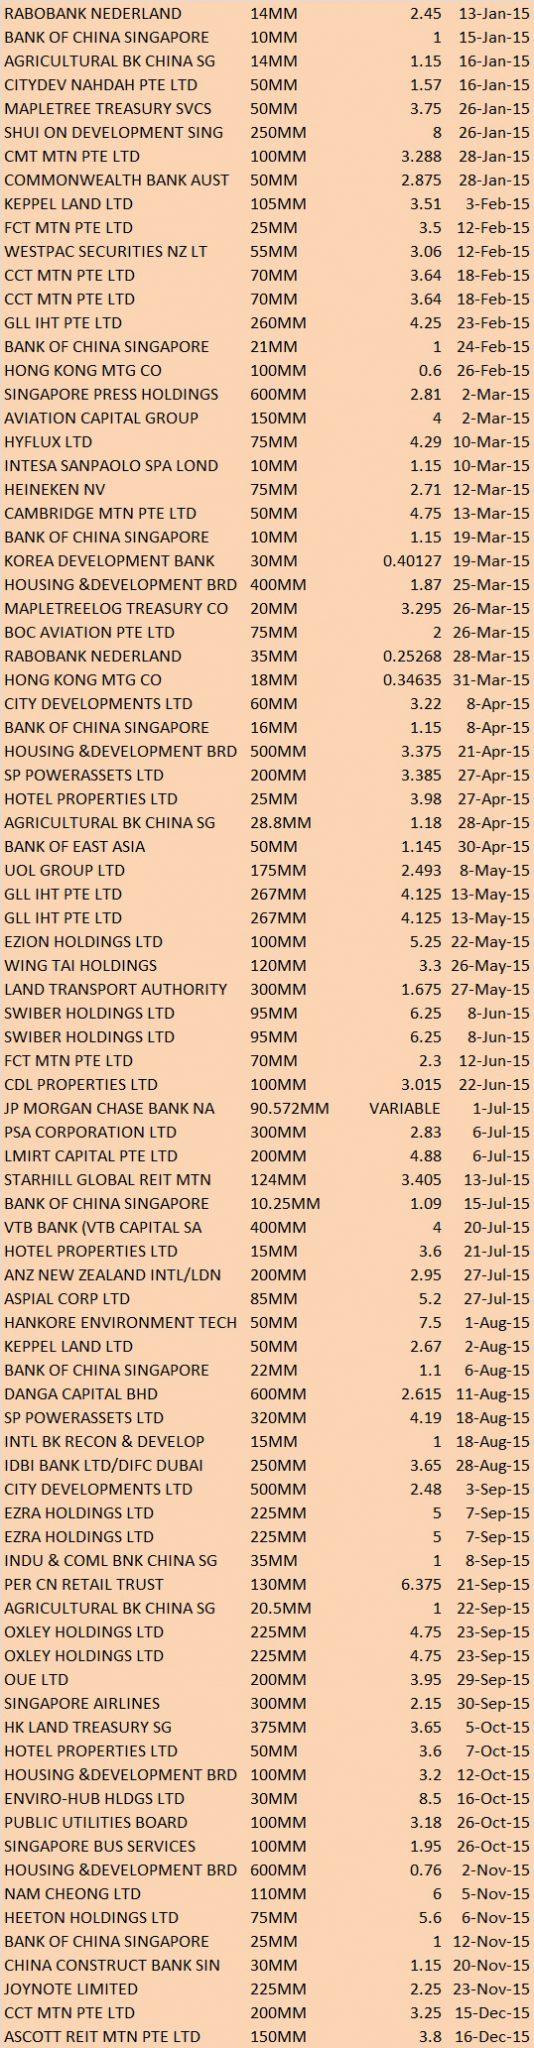 2015 bond maturities